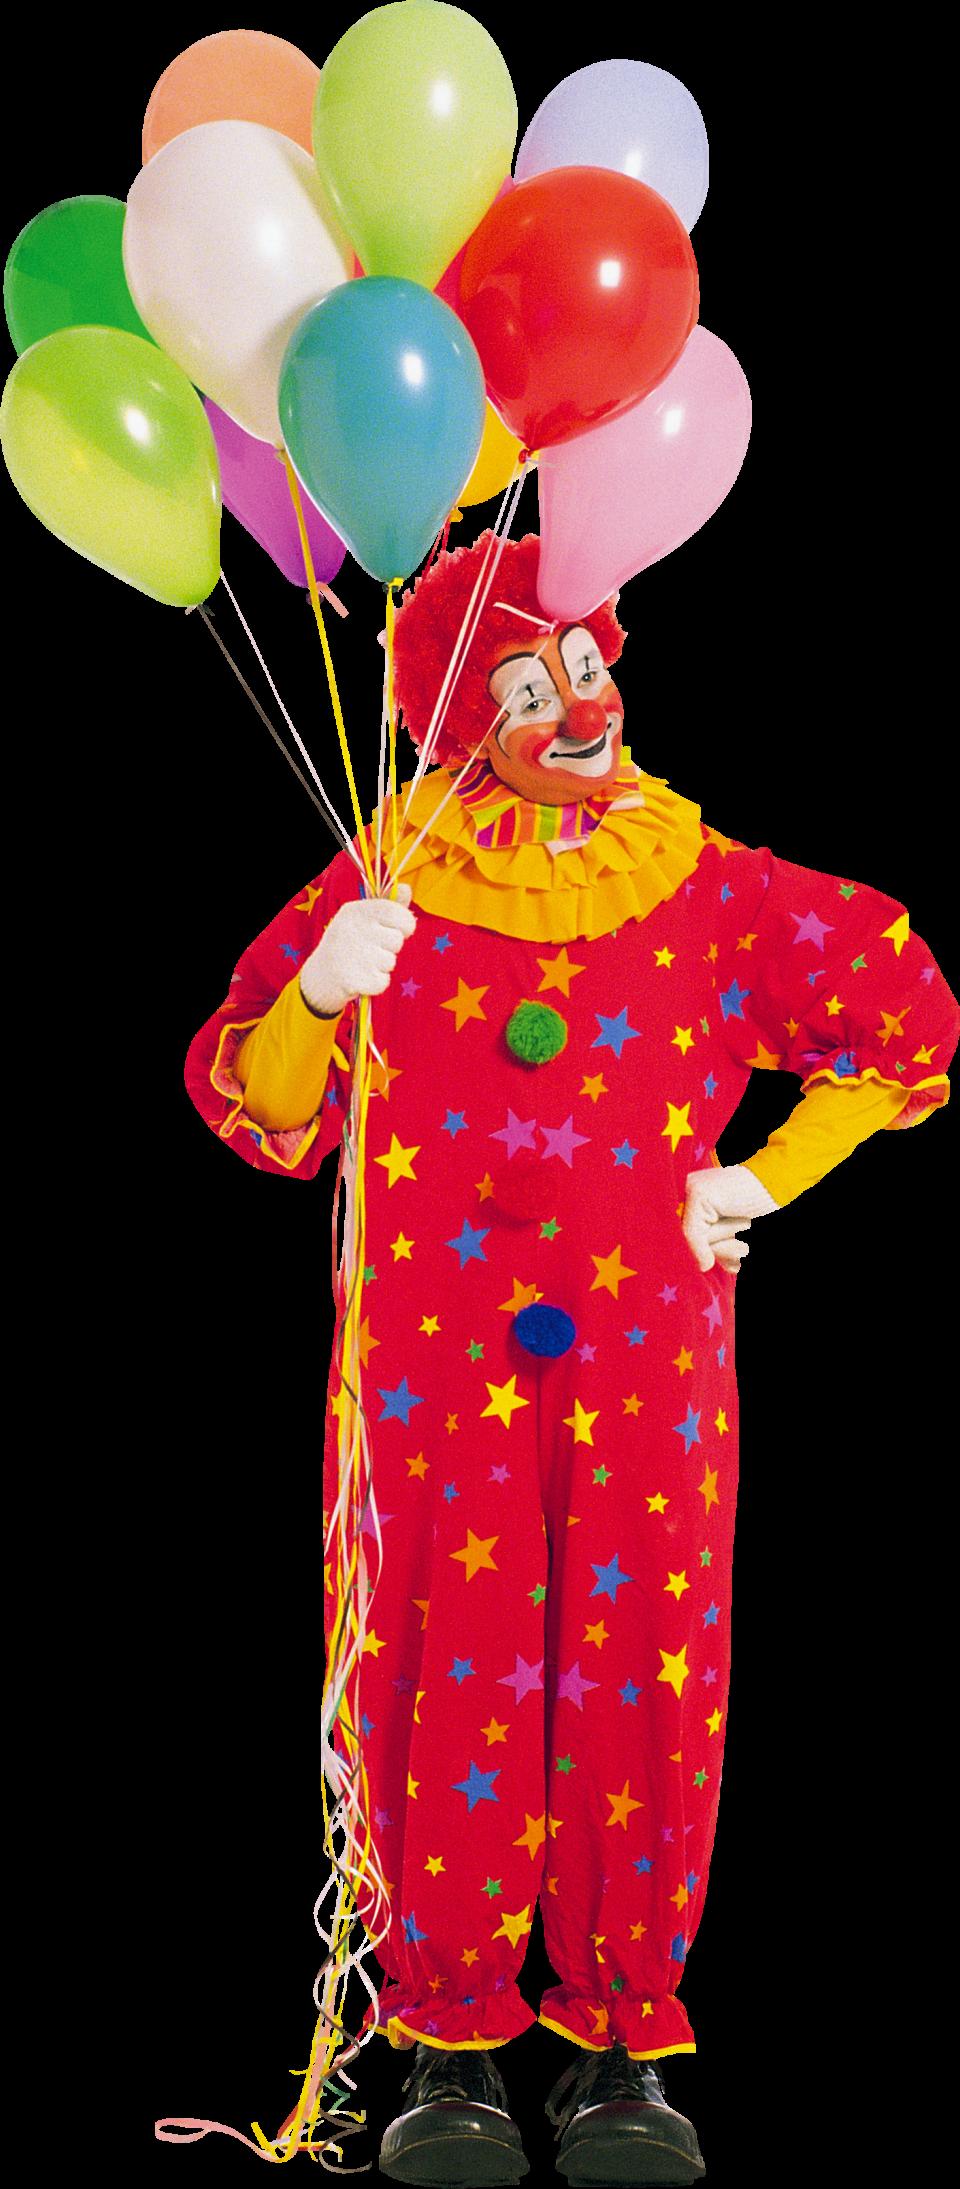 Clown PNG Image